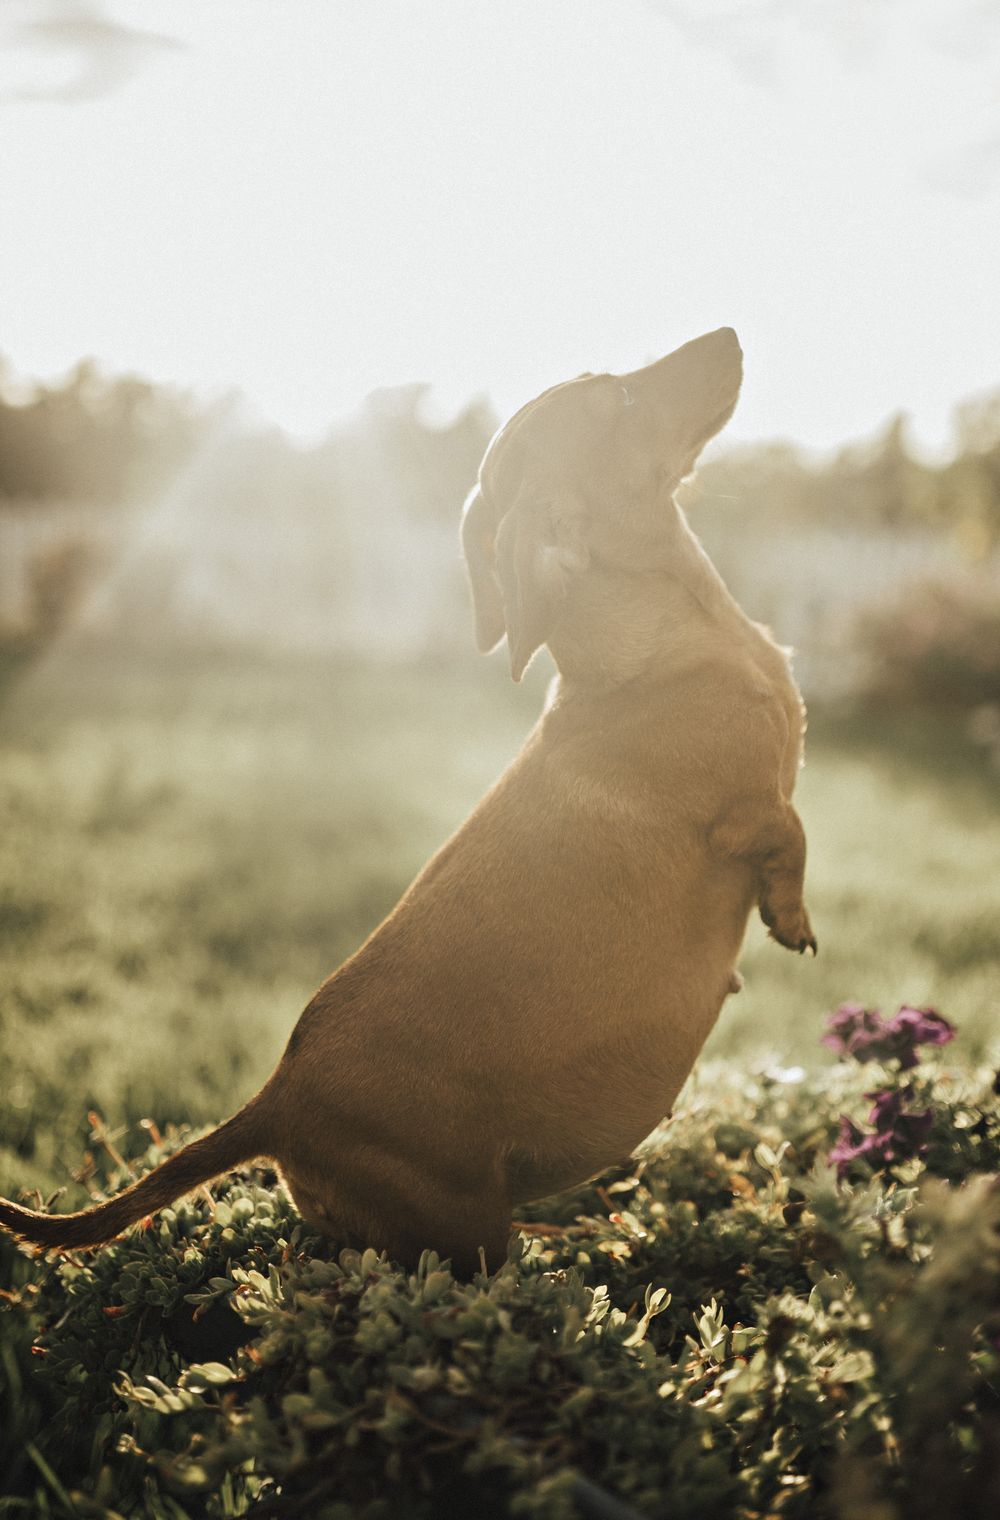 Cindi The Sausage Dog S Stunning Maternity Shoot Goes Viral